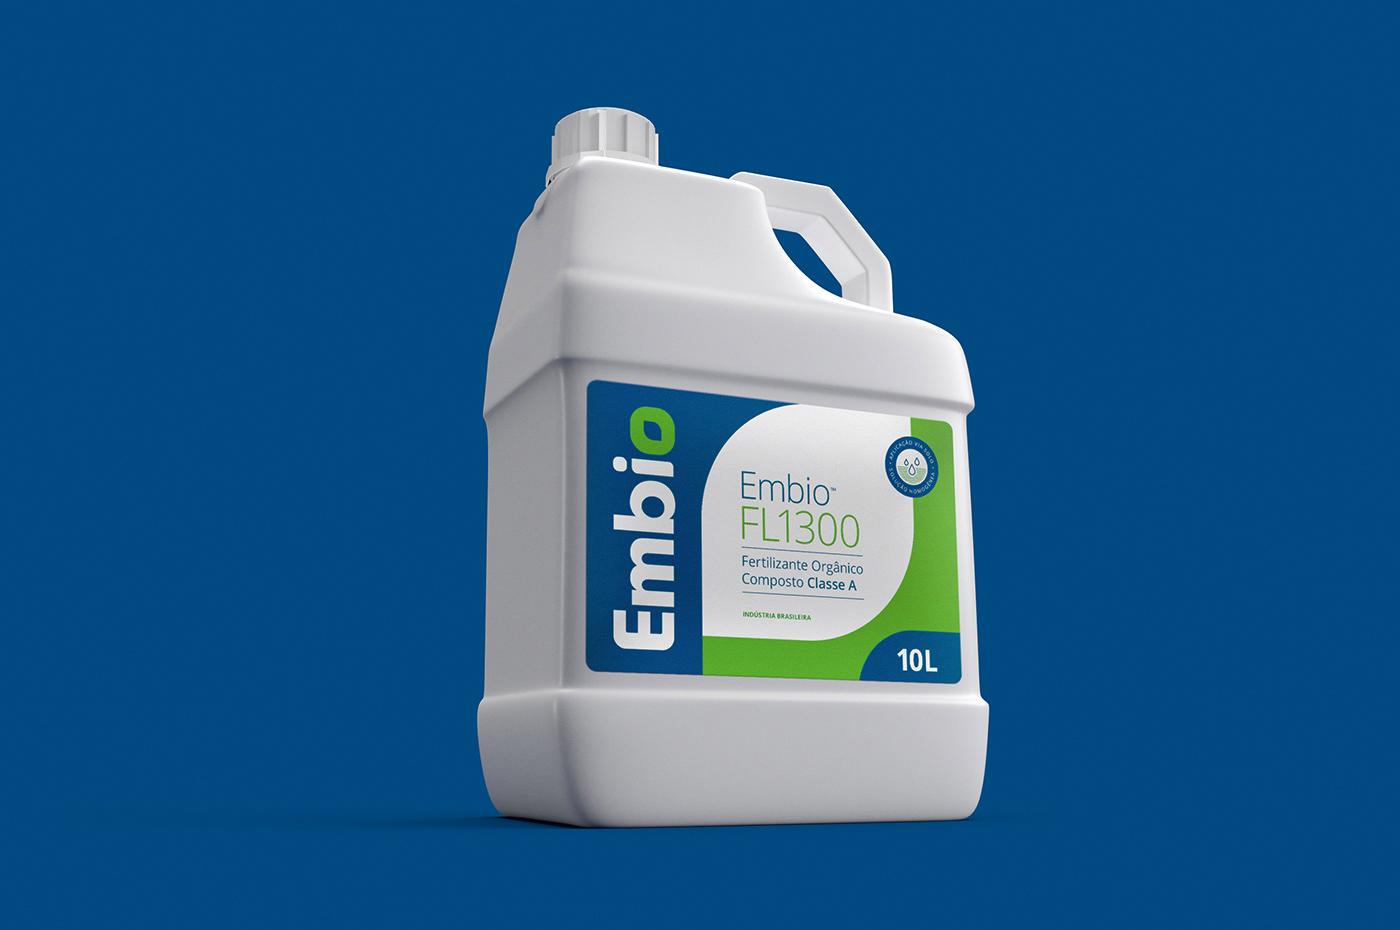 Fertilizer fertilizante organico embalagem Nature bio